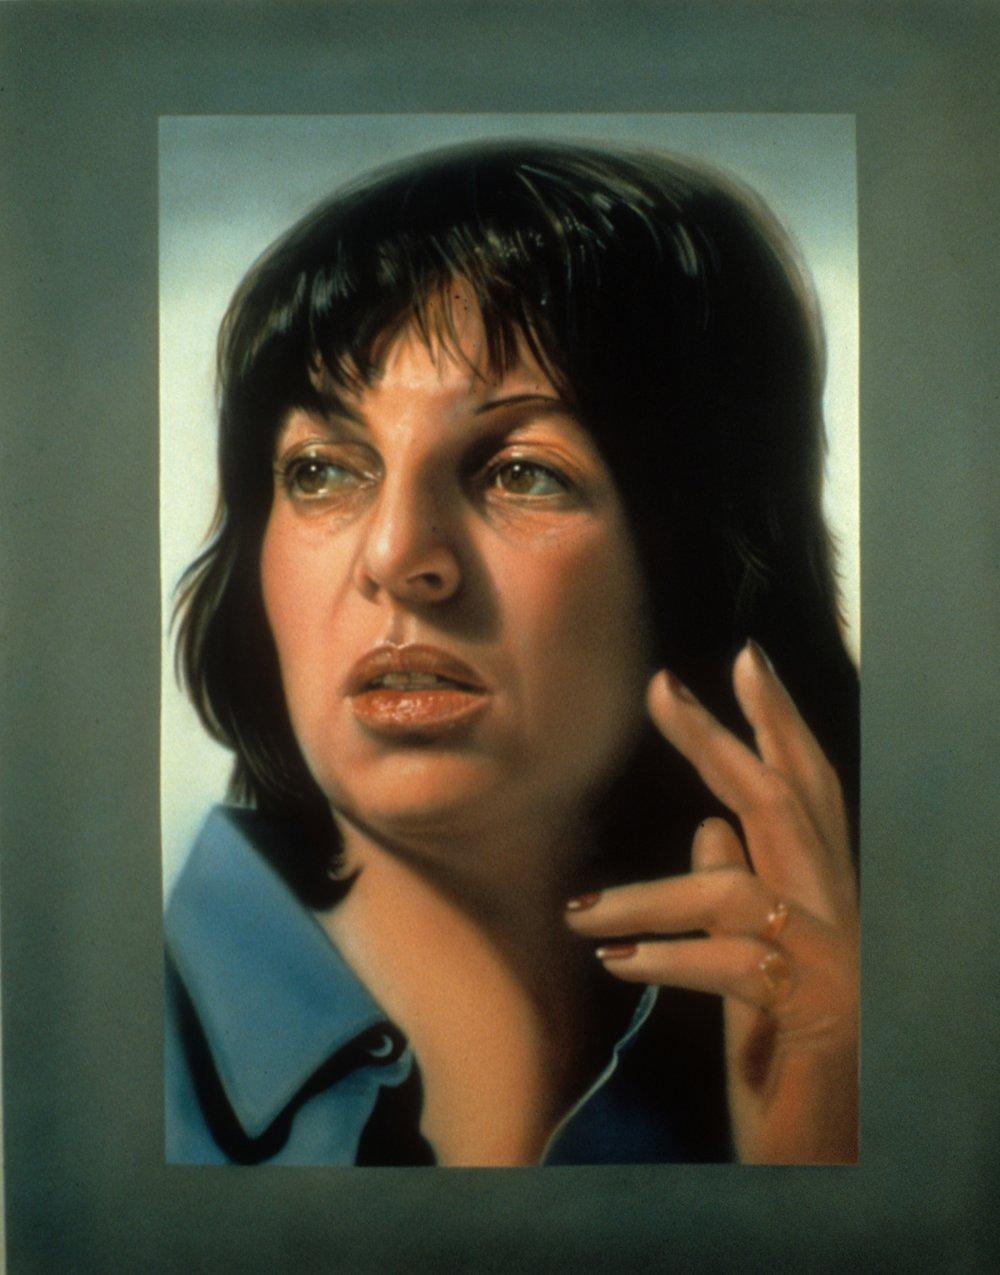 Flack_Self Portrait_1974_acrylic on canvas.jpg